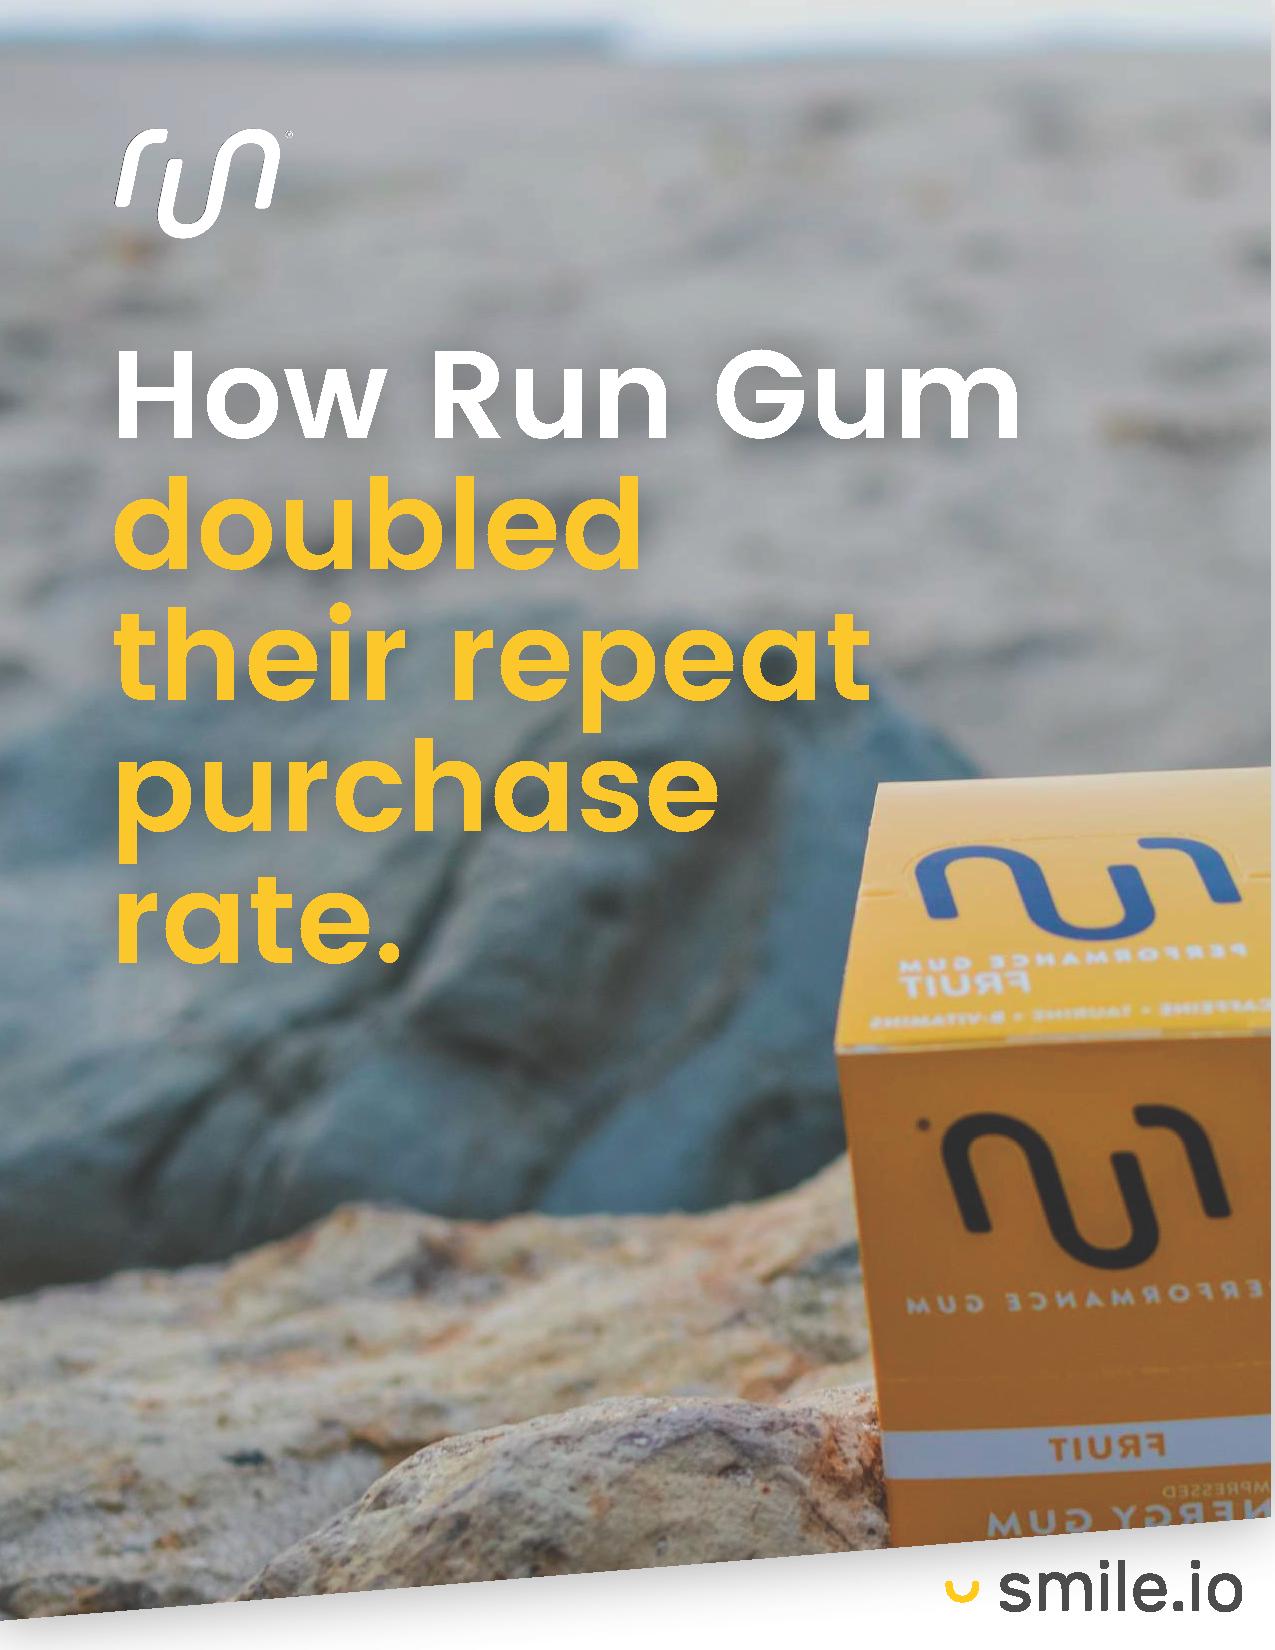 Shopify Case Study: Run Gum